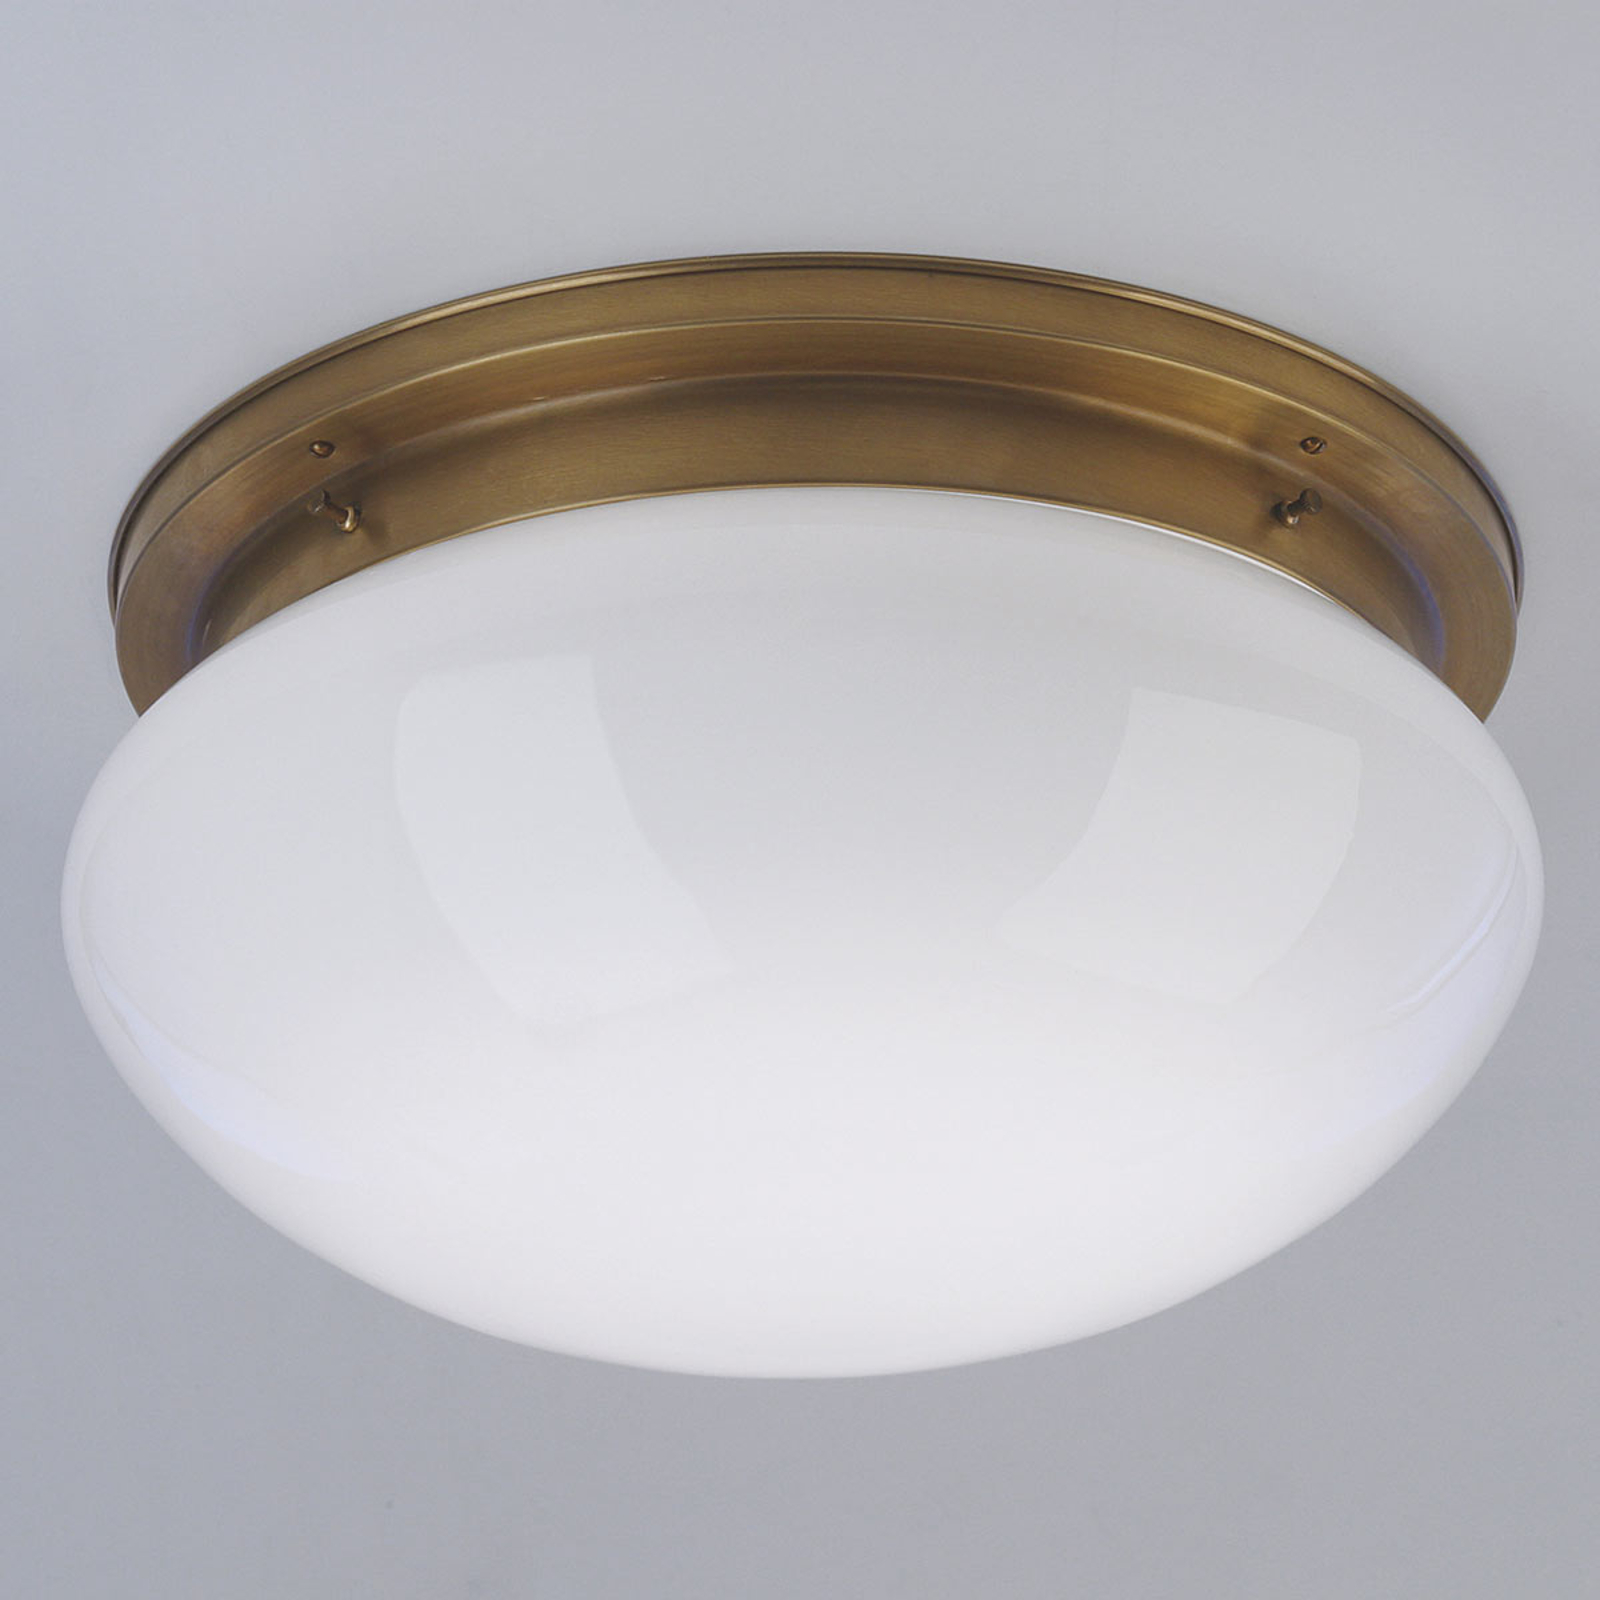 Grote plafondlamp Harry van messing Ø 40 cm